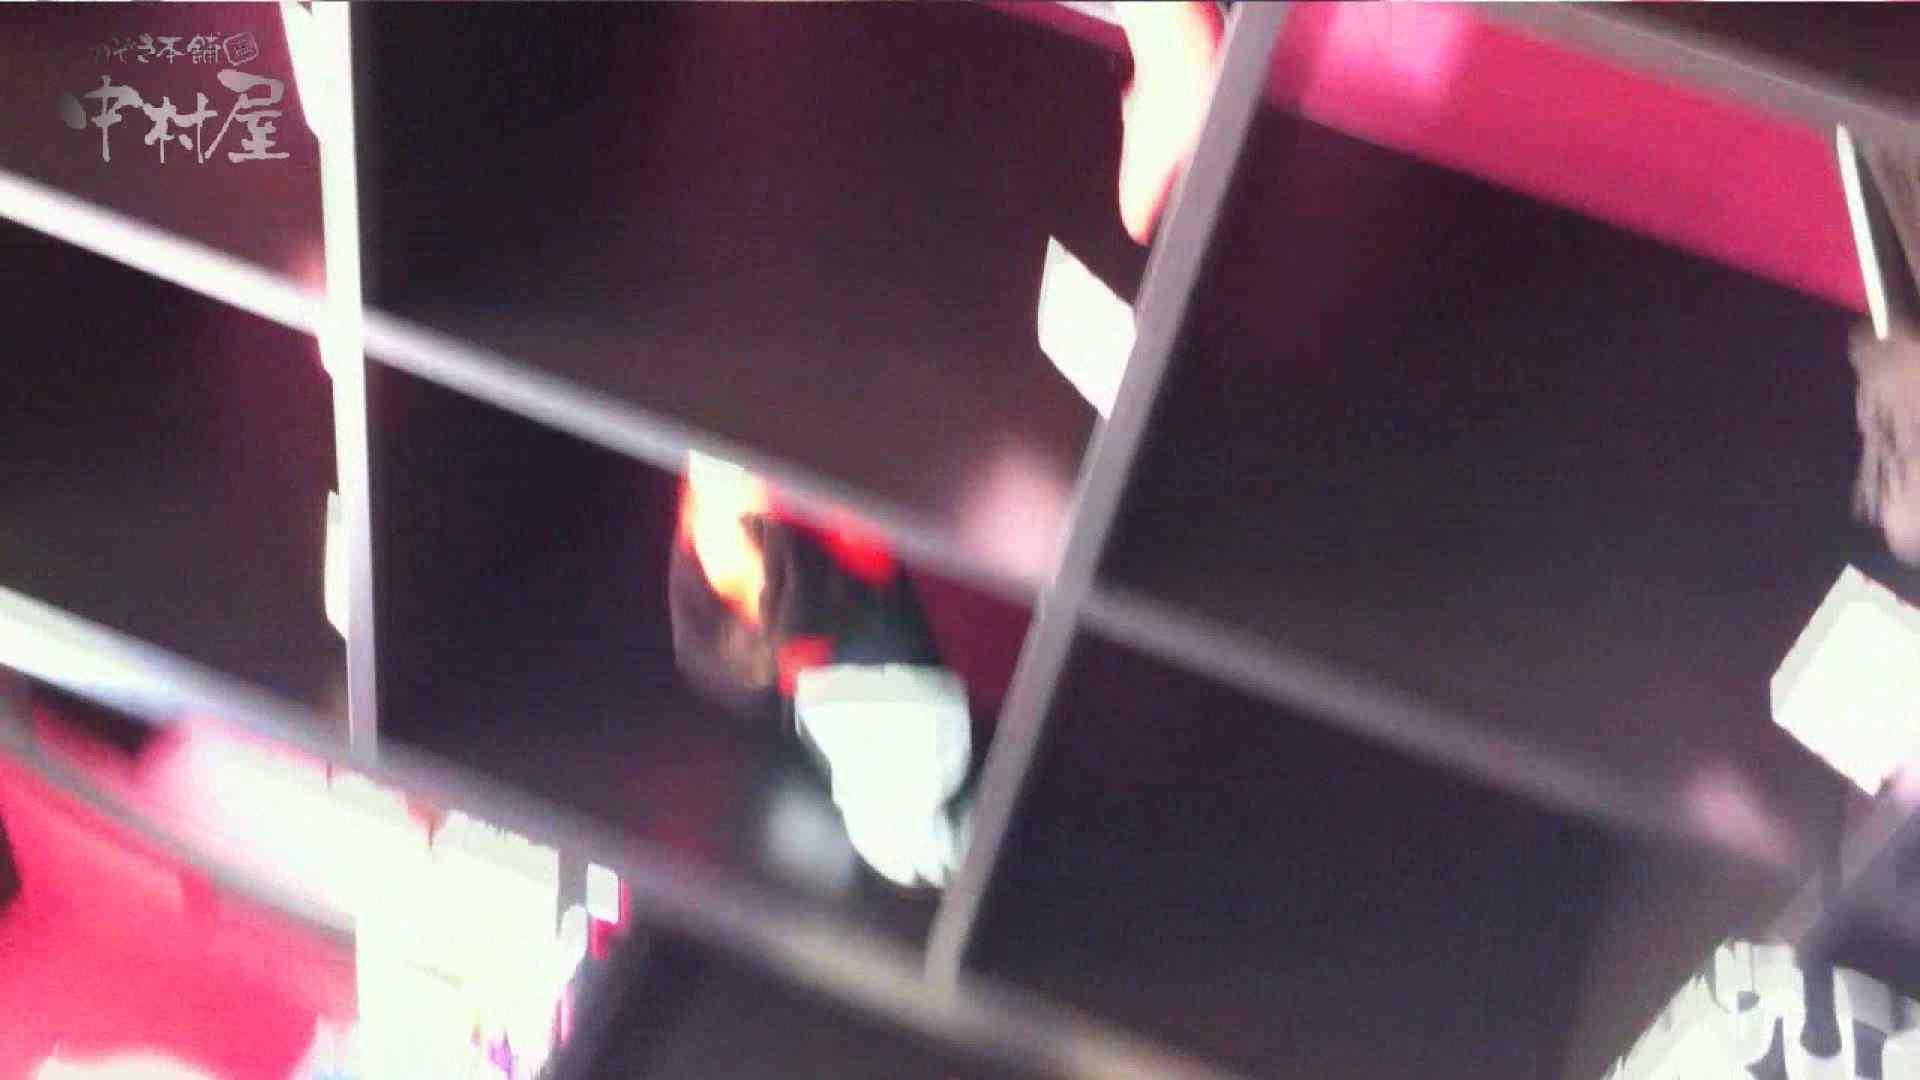 vol.70 美人アパレル胸チラ&パンチラ ベレー店員さんの下着 OLエロ画像 盗撮われめAV動画紹介 90PICs 80